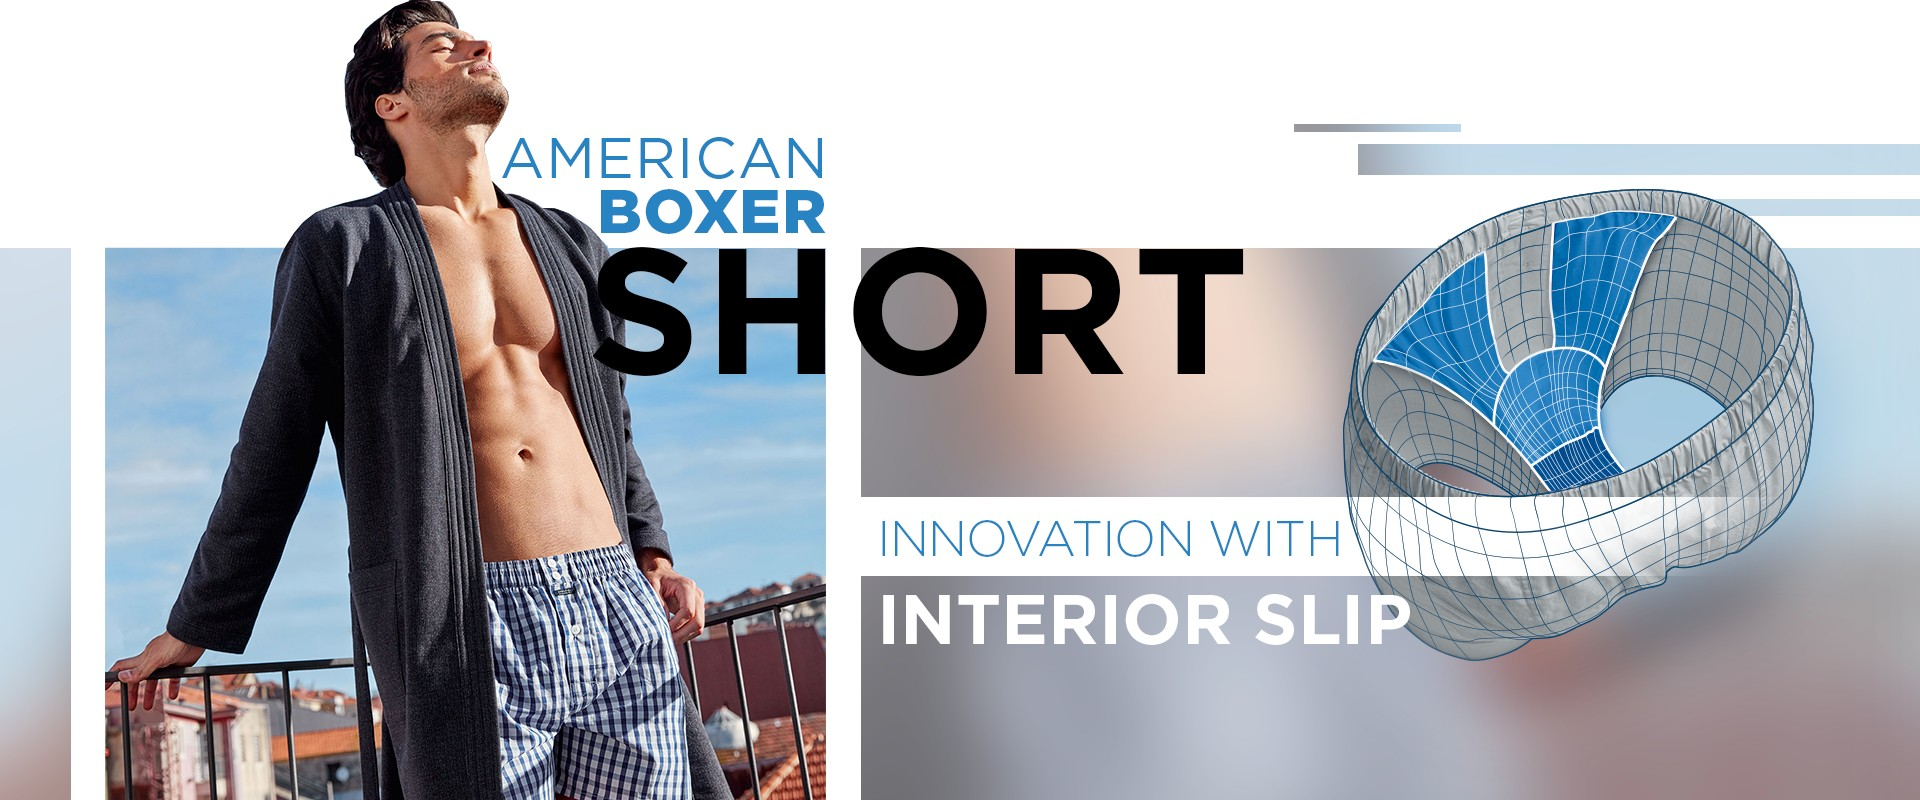 American boxer short_1